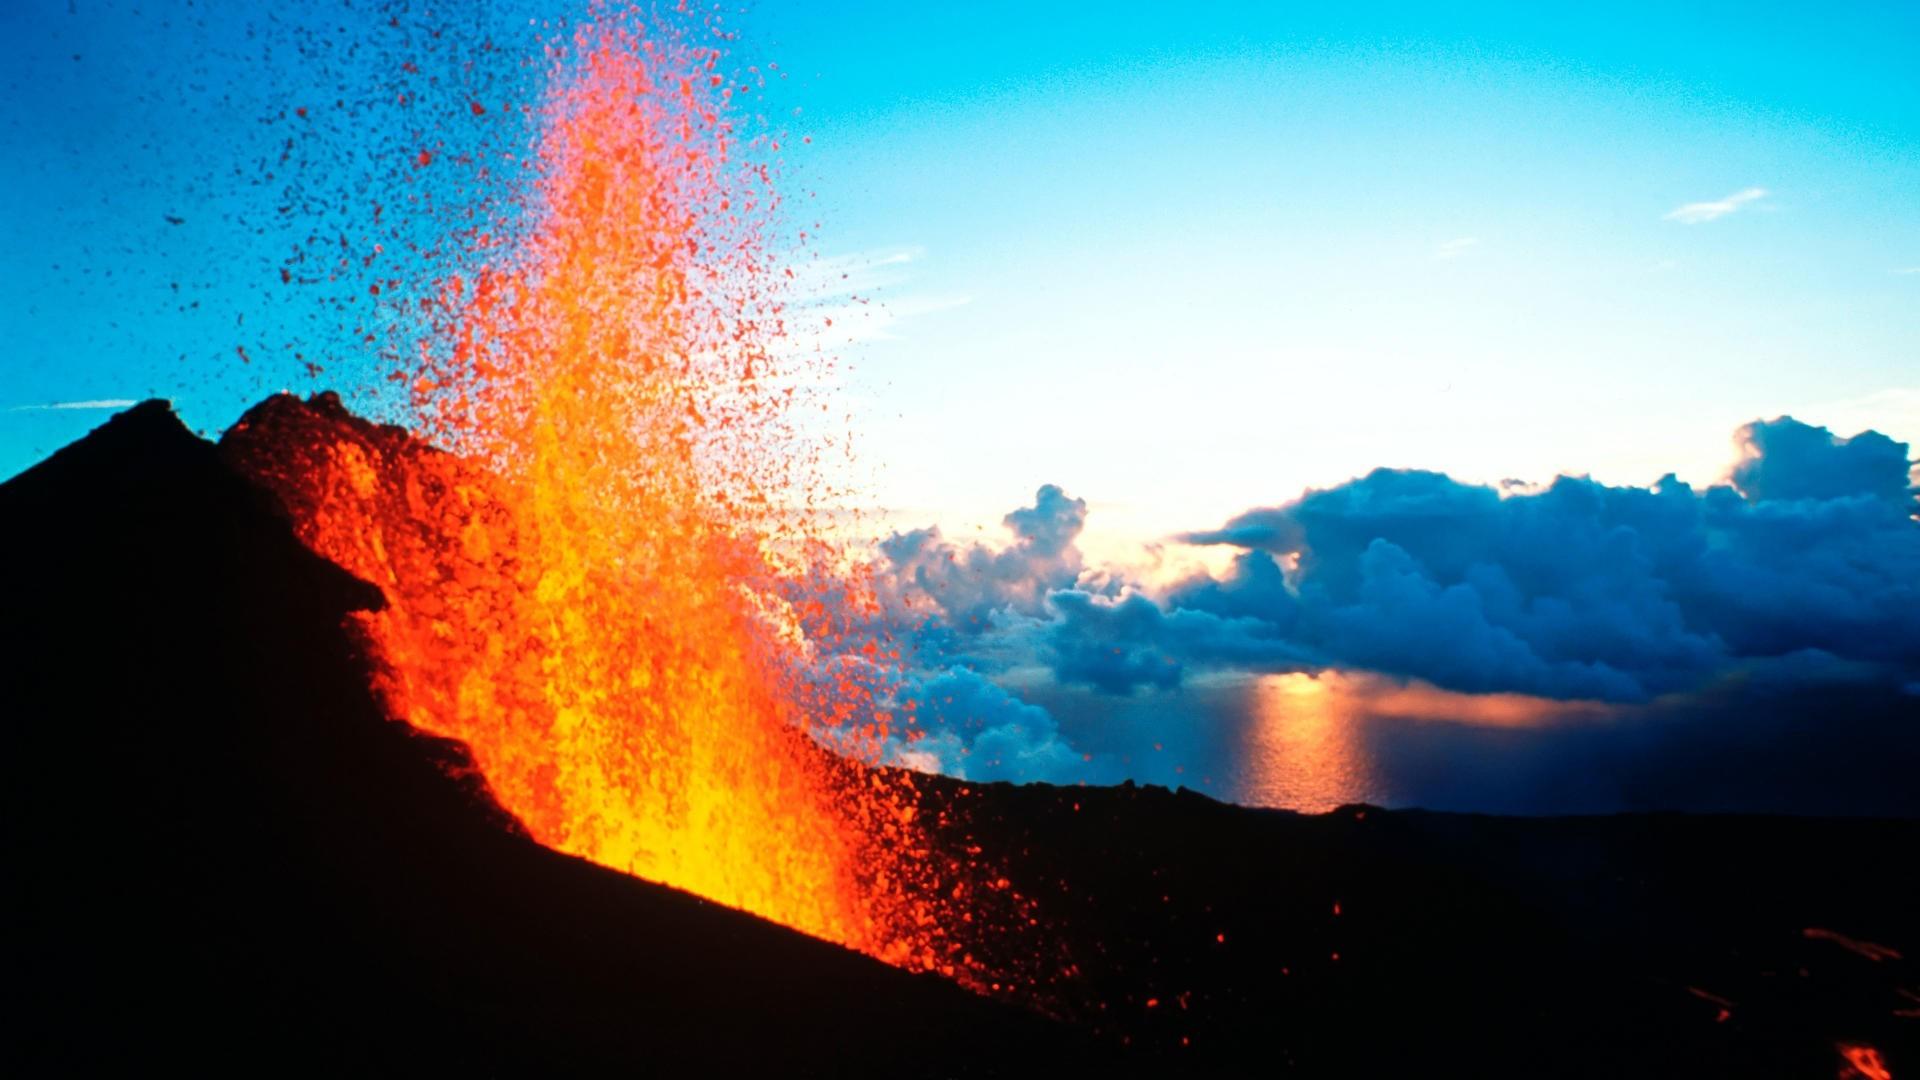 Full HD p Volcano Wallpapers HD, Desktop Backgrounds 1920×1080 Volcano  Wallpapers HD (